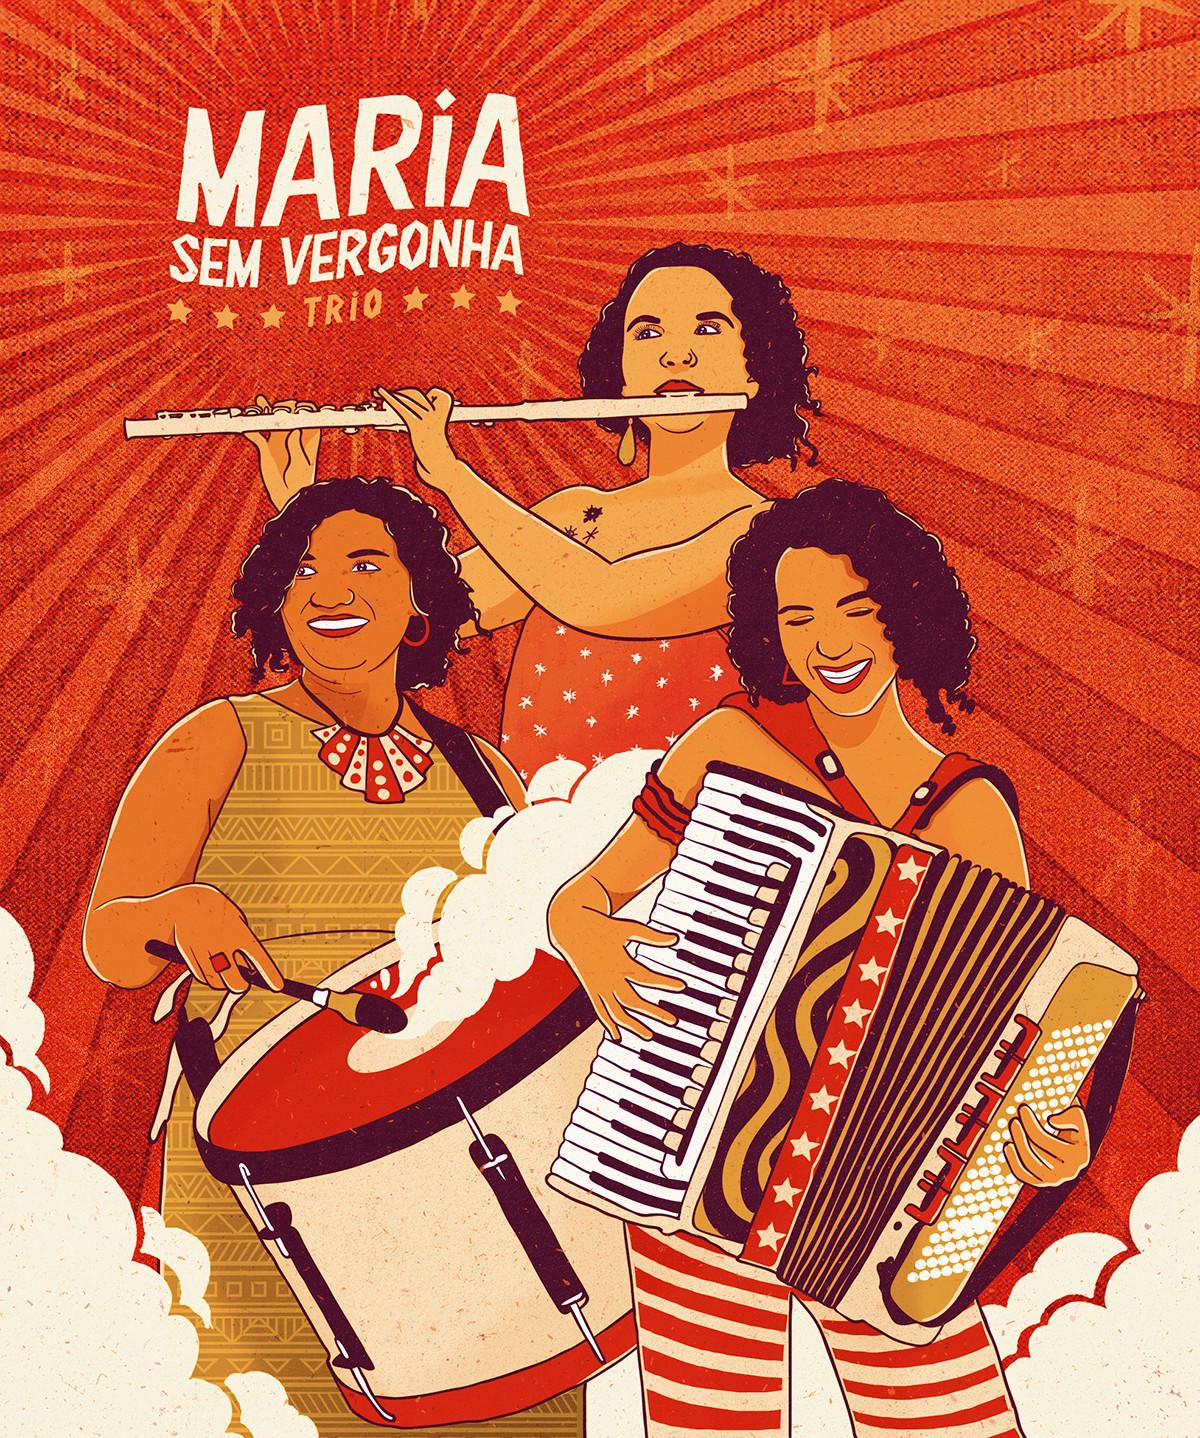 Maria Sem Vergonha Trio